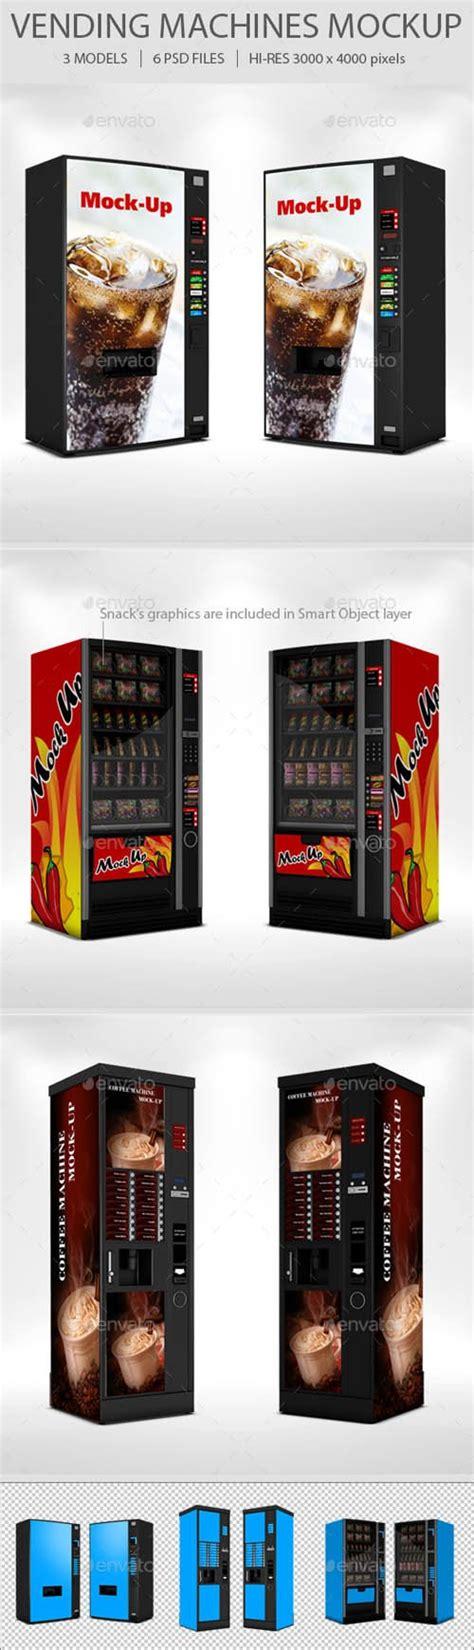 bebida ephotoshop template can soda gr vending machine mockup set 19037242 stuff to buyd